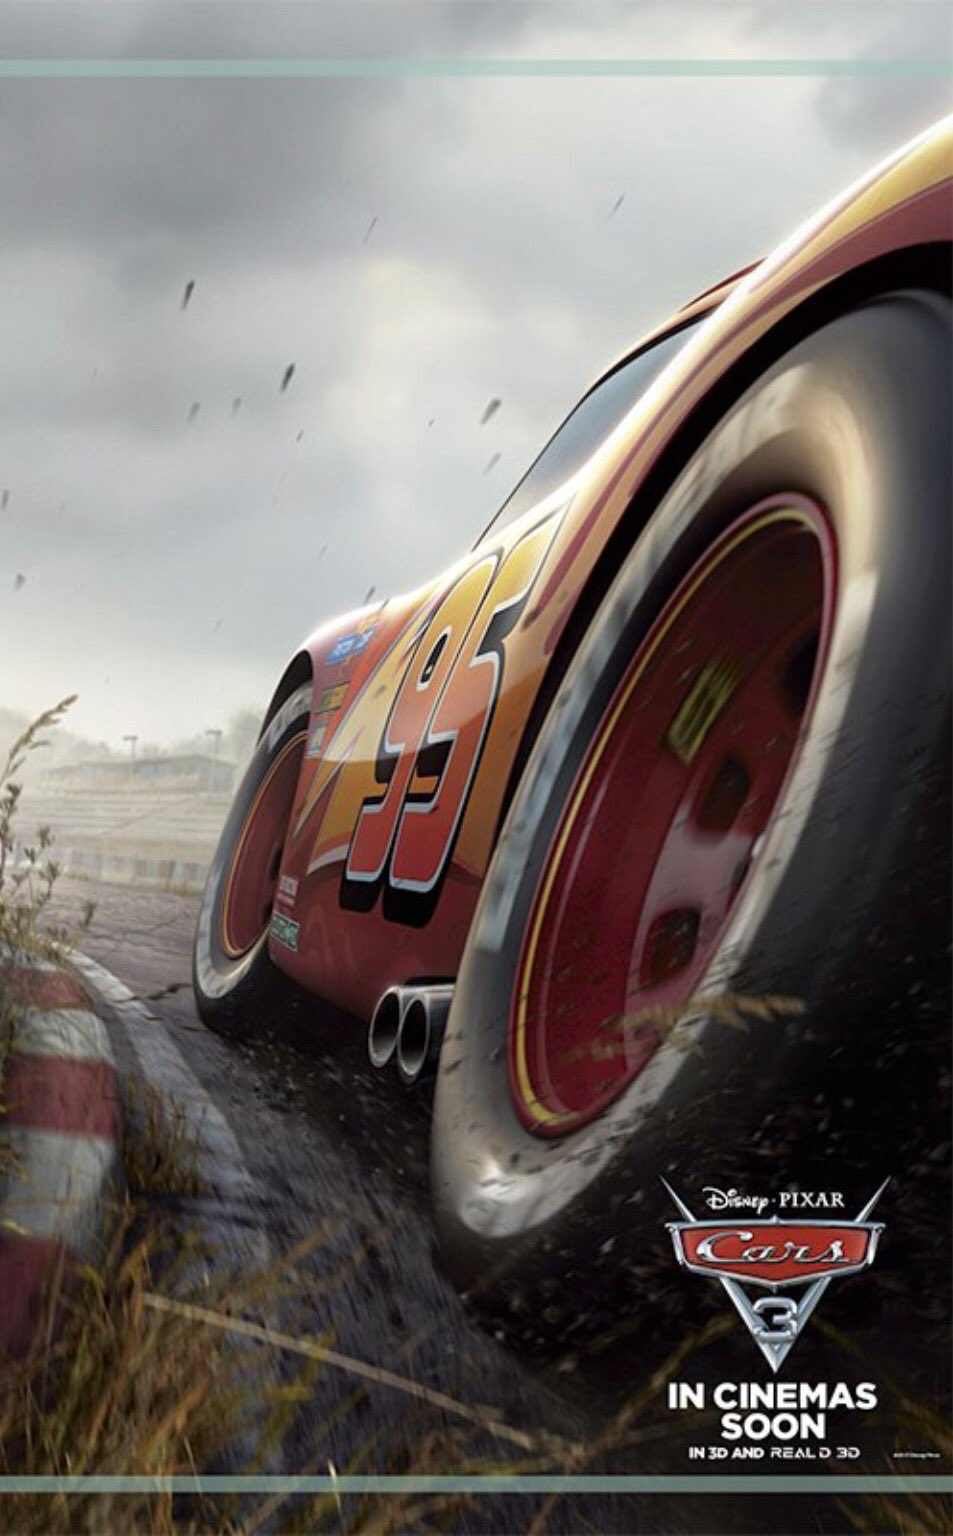 Epingle Par Edd Grice Sur Lightning Mcqueen And Cars Film Cars Voitures Disney Image Voiture